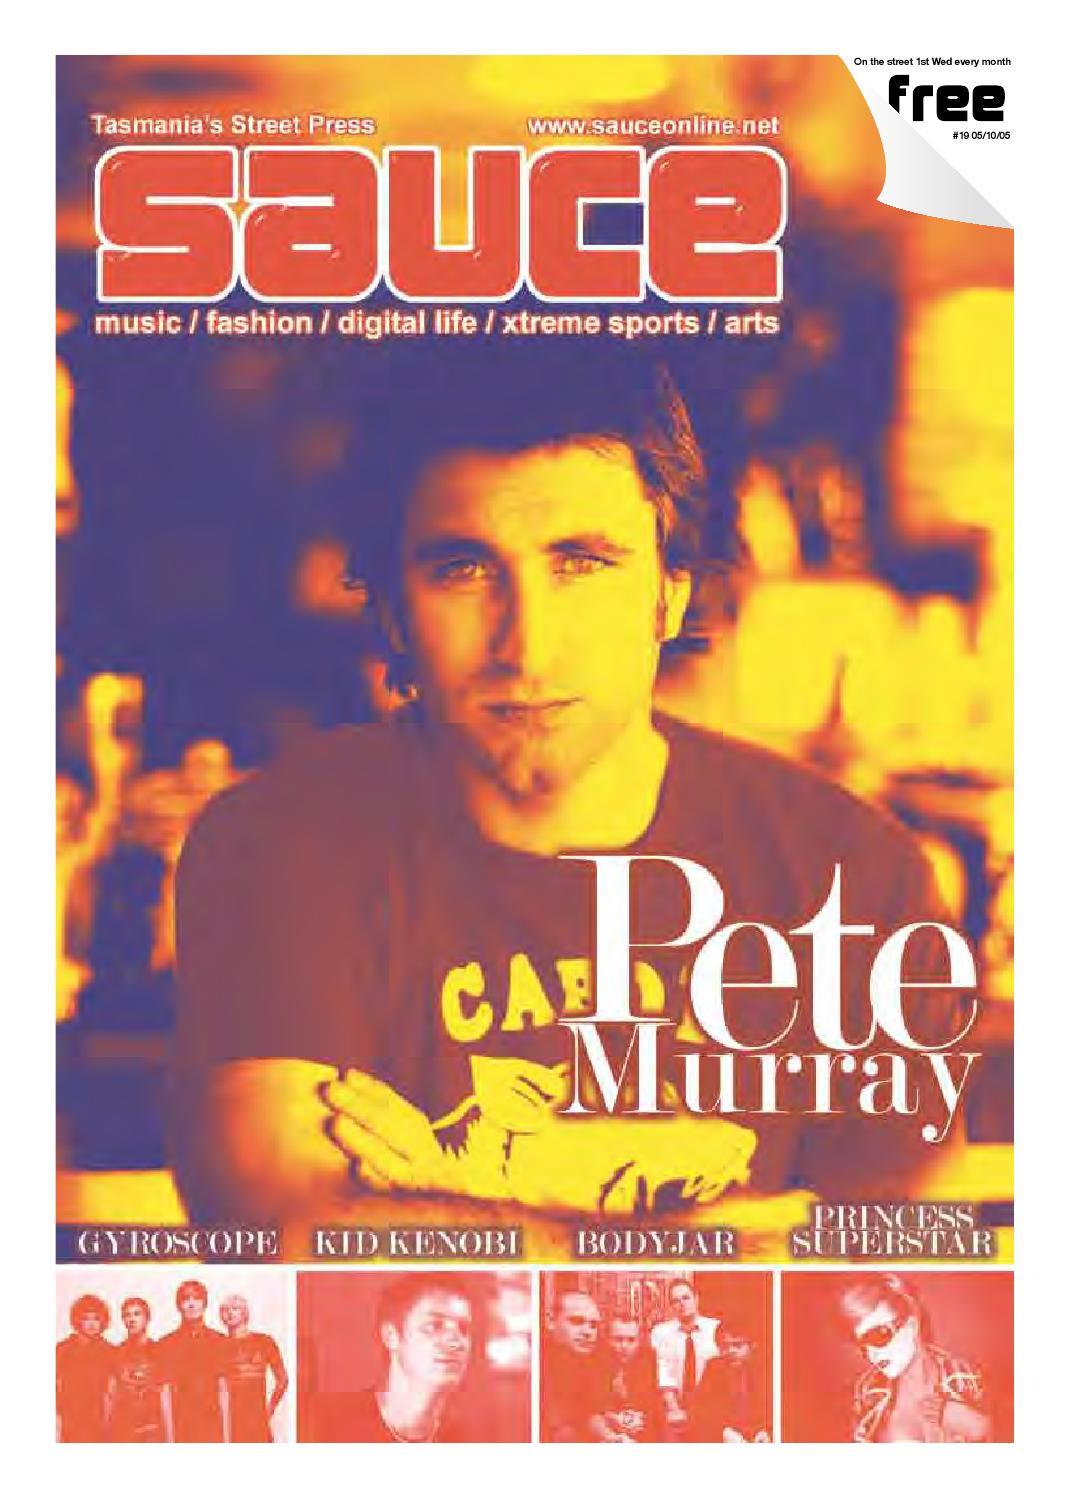 Sauce - Issue 19, 05-10-05 by David K Q Williams - issuu